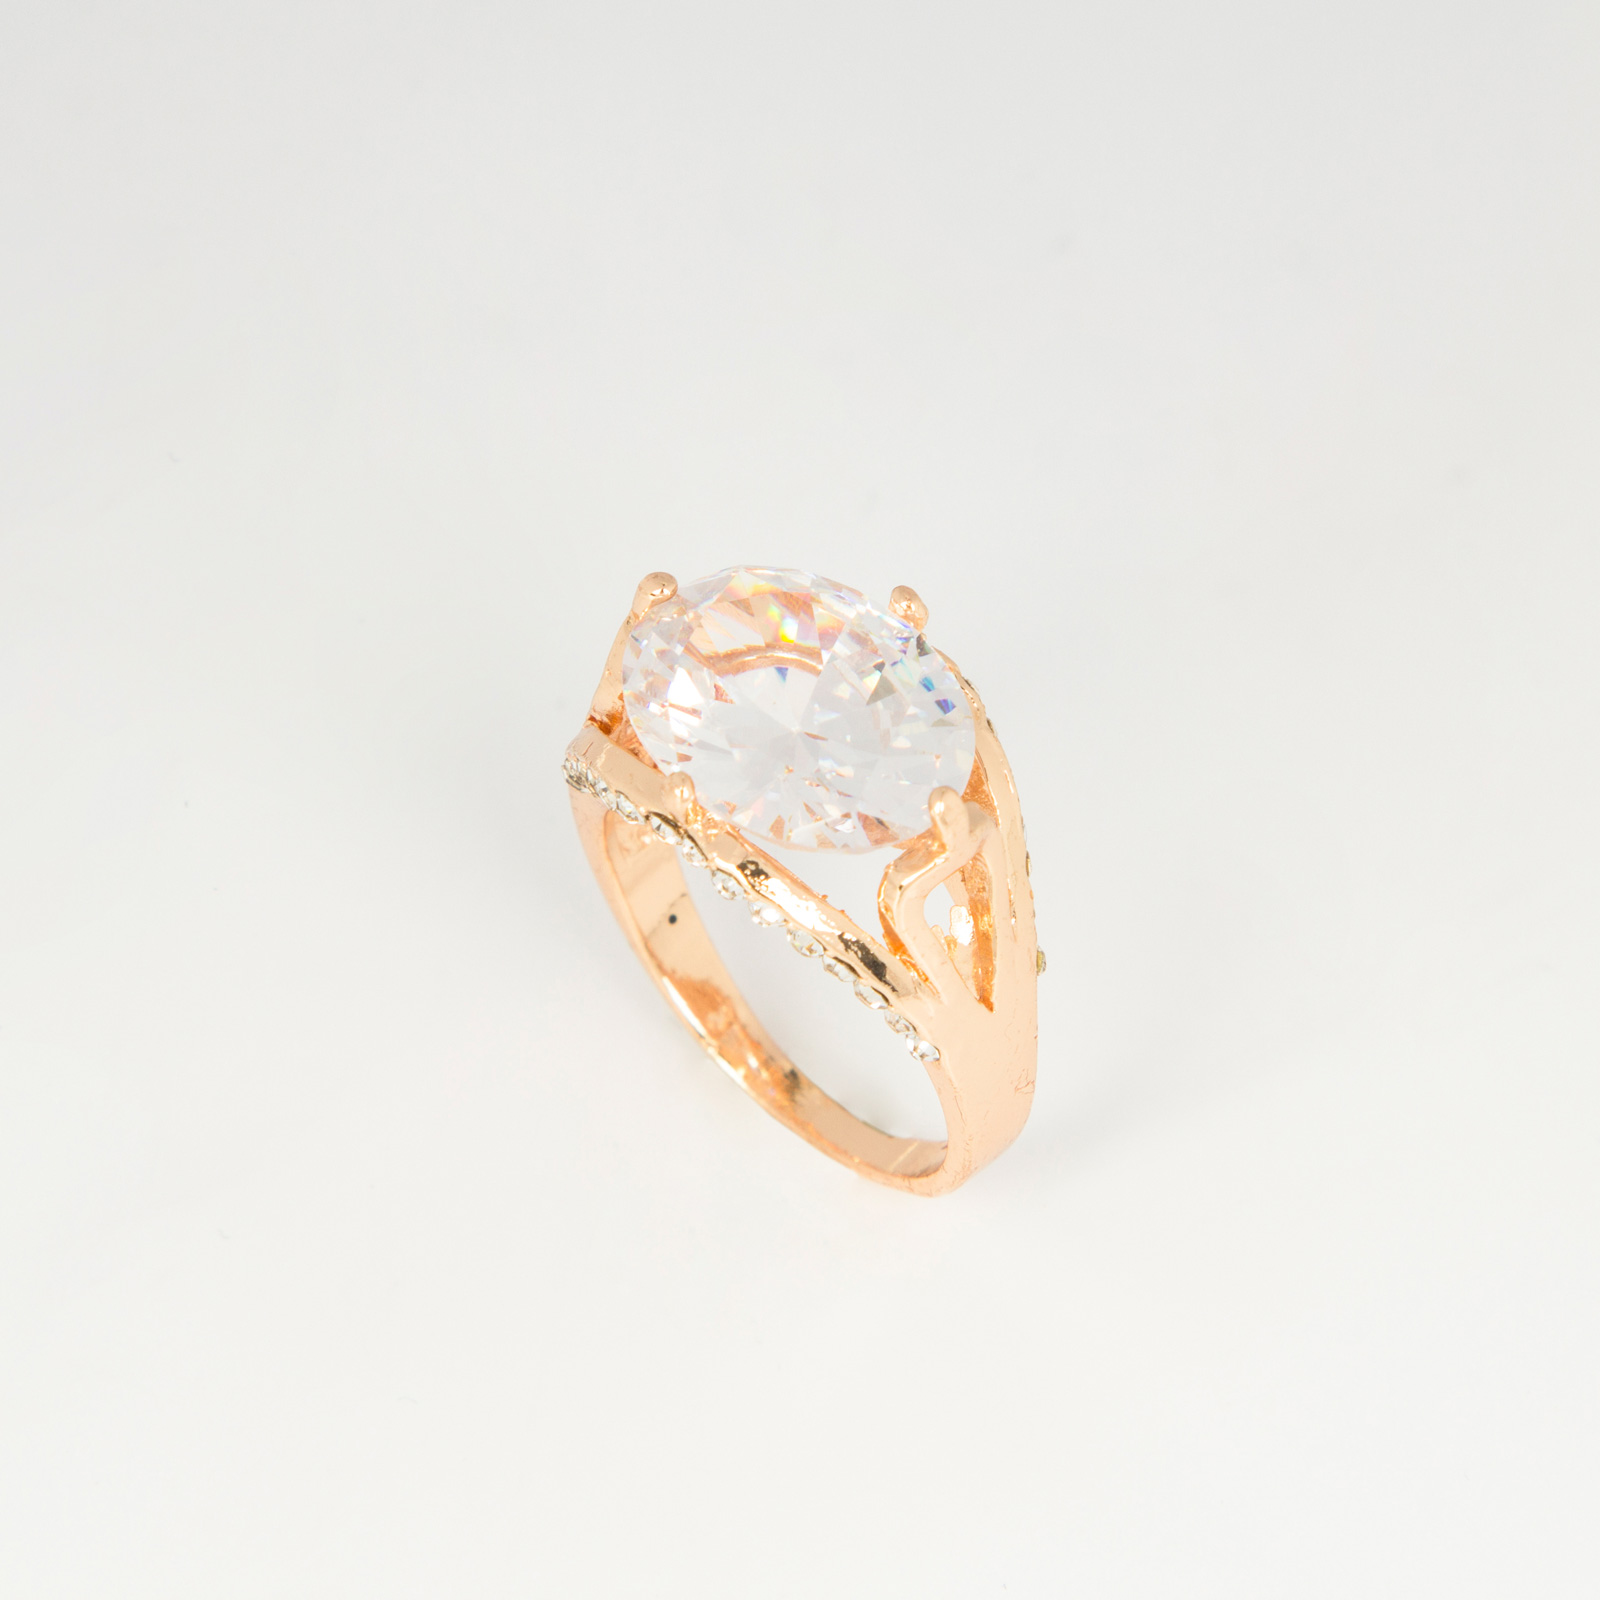 Продажа бриллиантов в москве цена